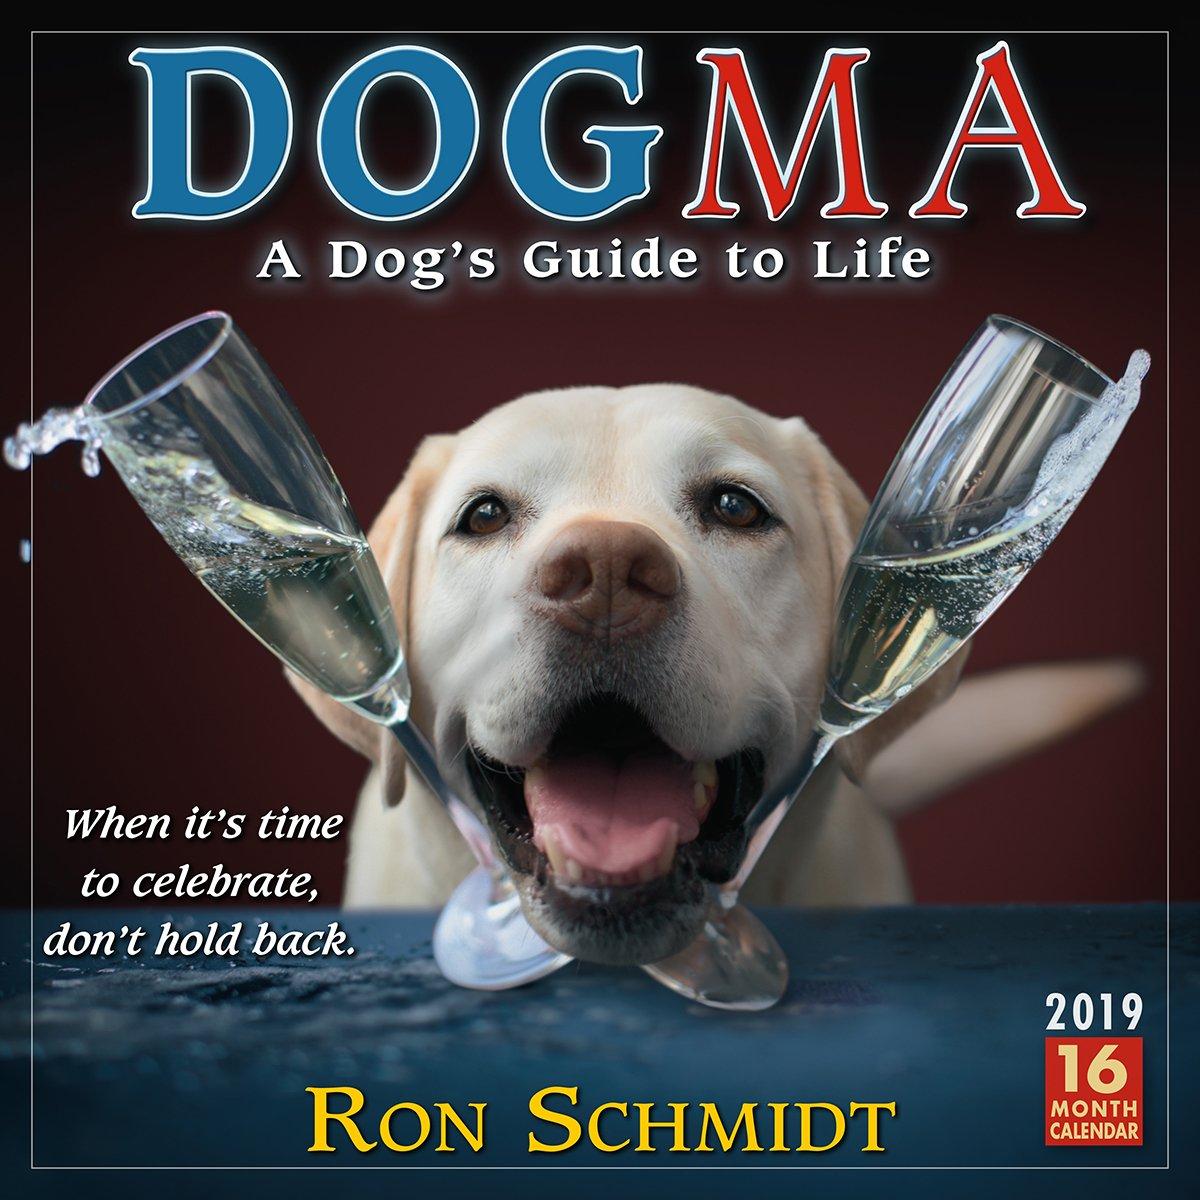 Dogma 2019 Wall Calendar, A Dog's Guide to Life, 12 x 12, (CA-0424)